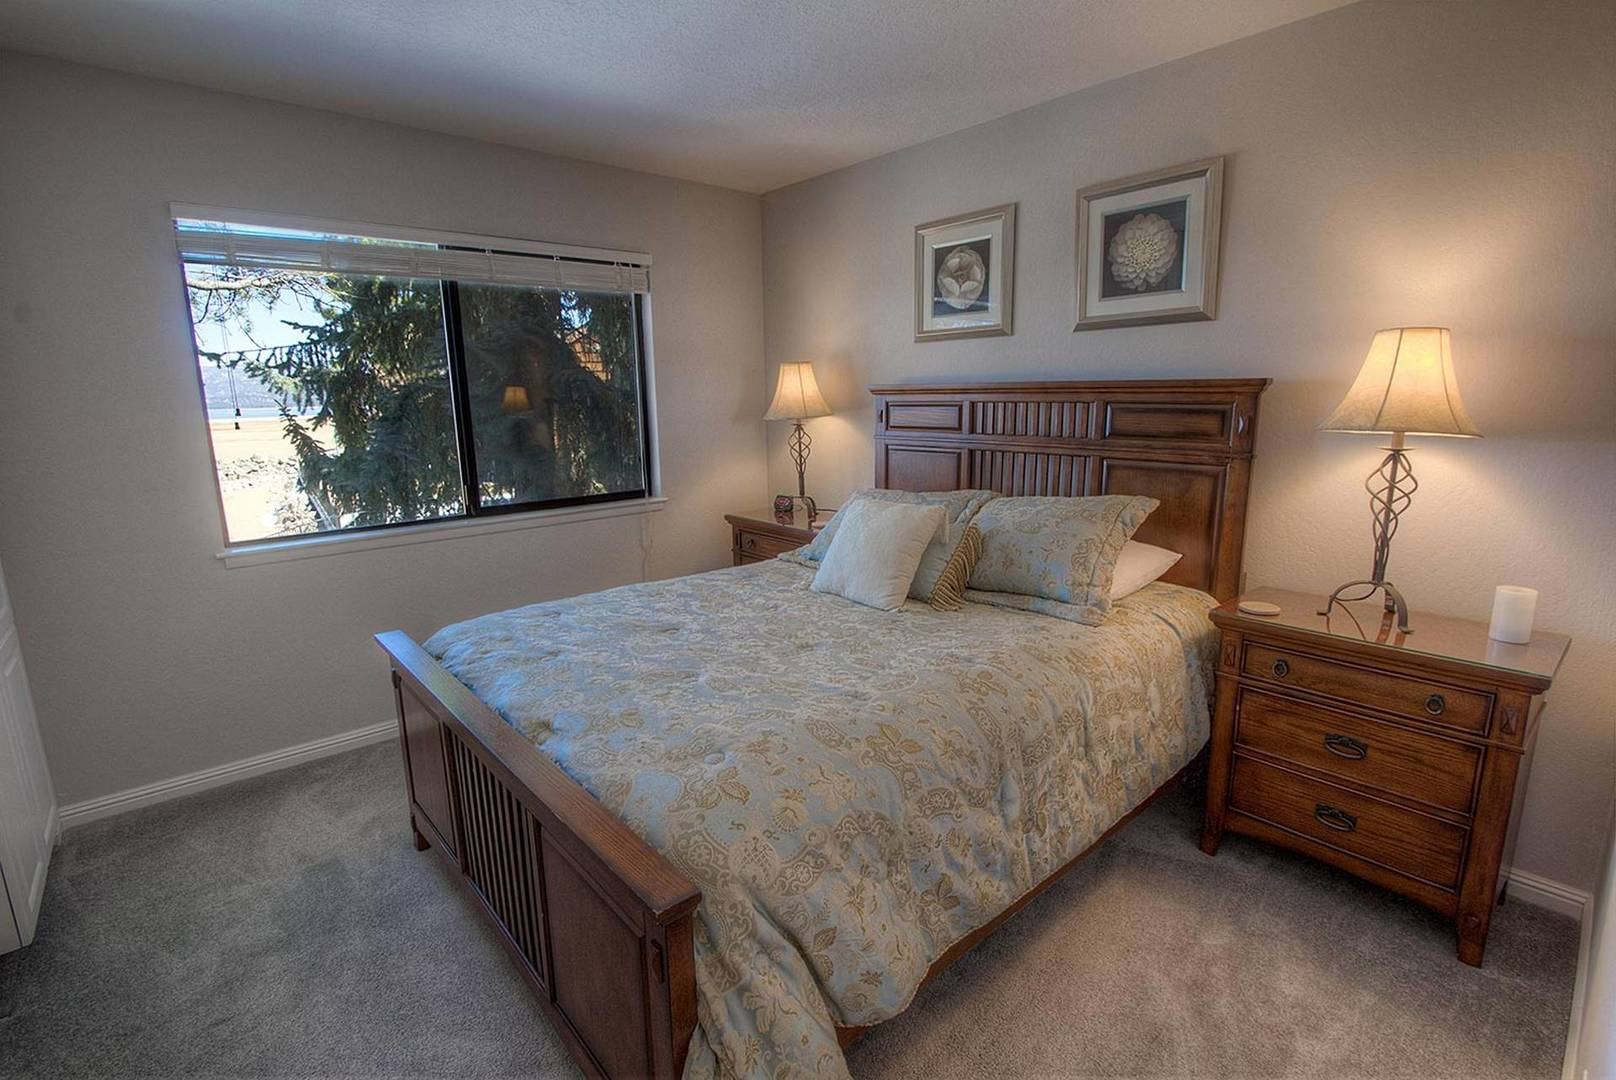 tkc0863 bedroom